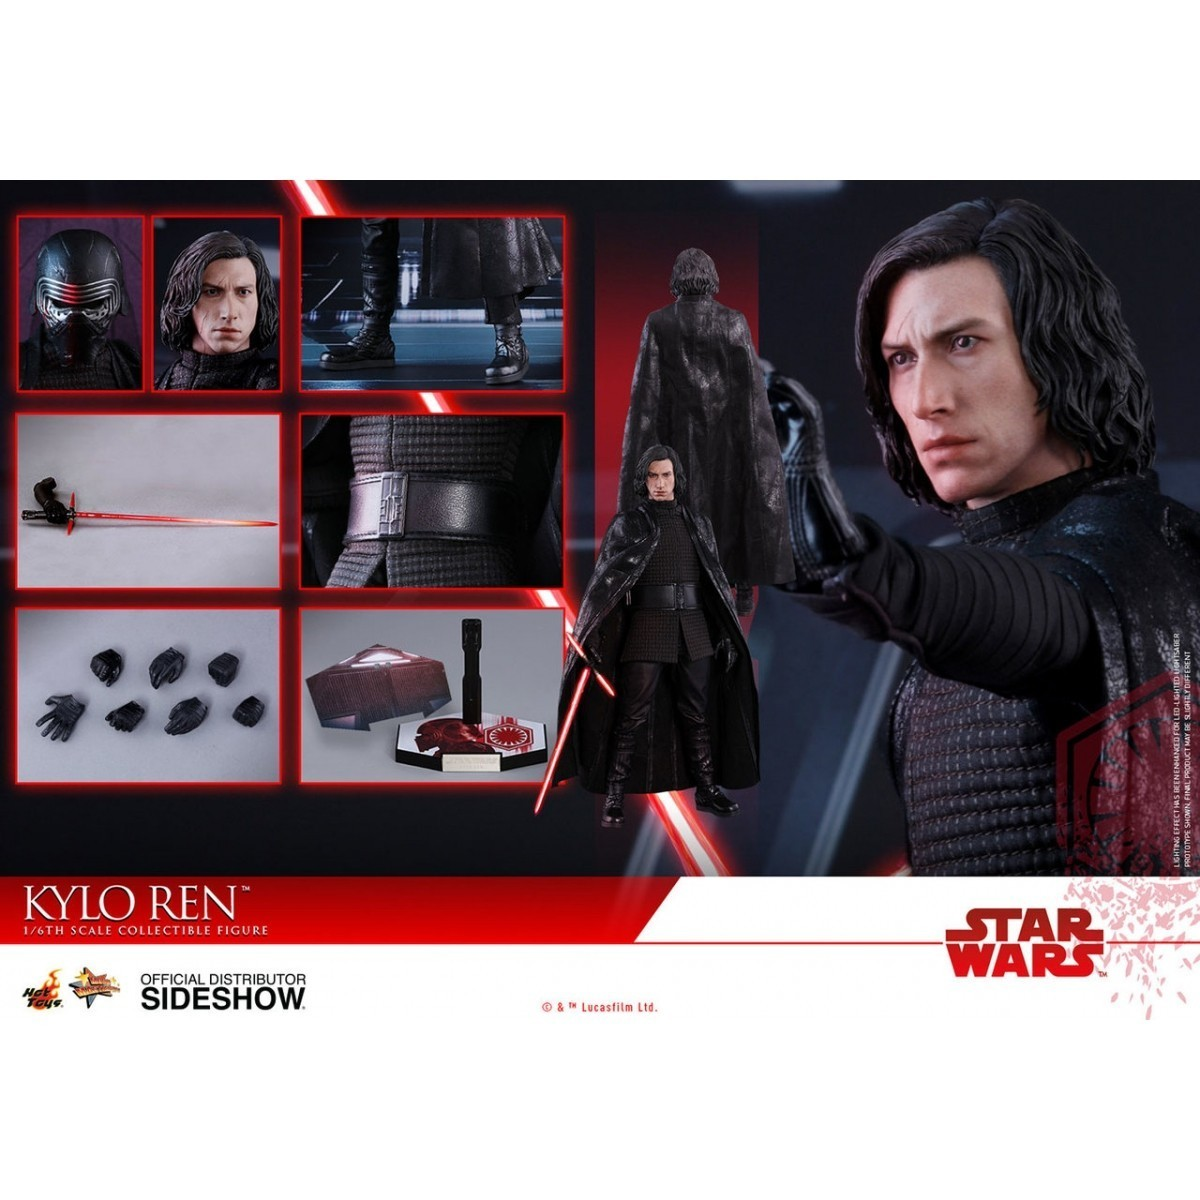 PRÉ VENDA: Boneco Kylo Ren: Star Wars Os Últimos Jedi (The Last Jedi) Escala 1/6 - Hot Toys